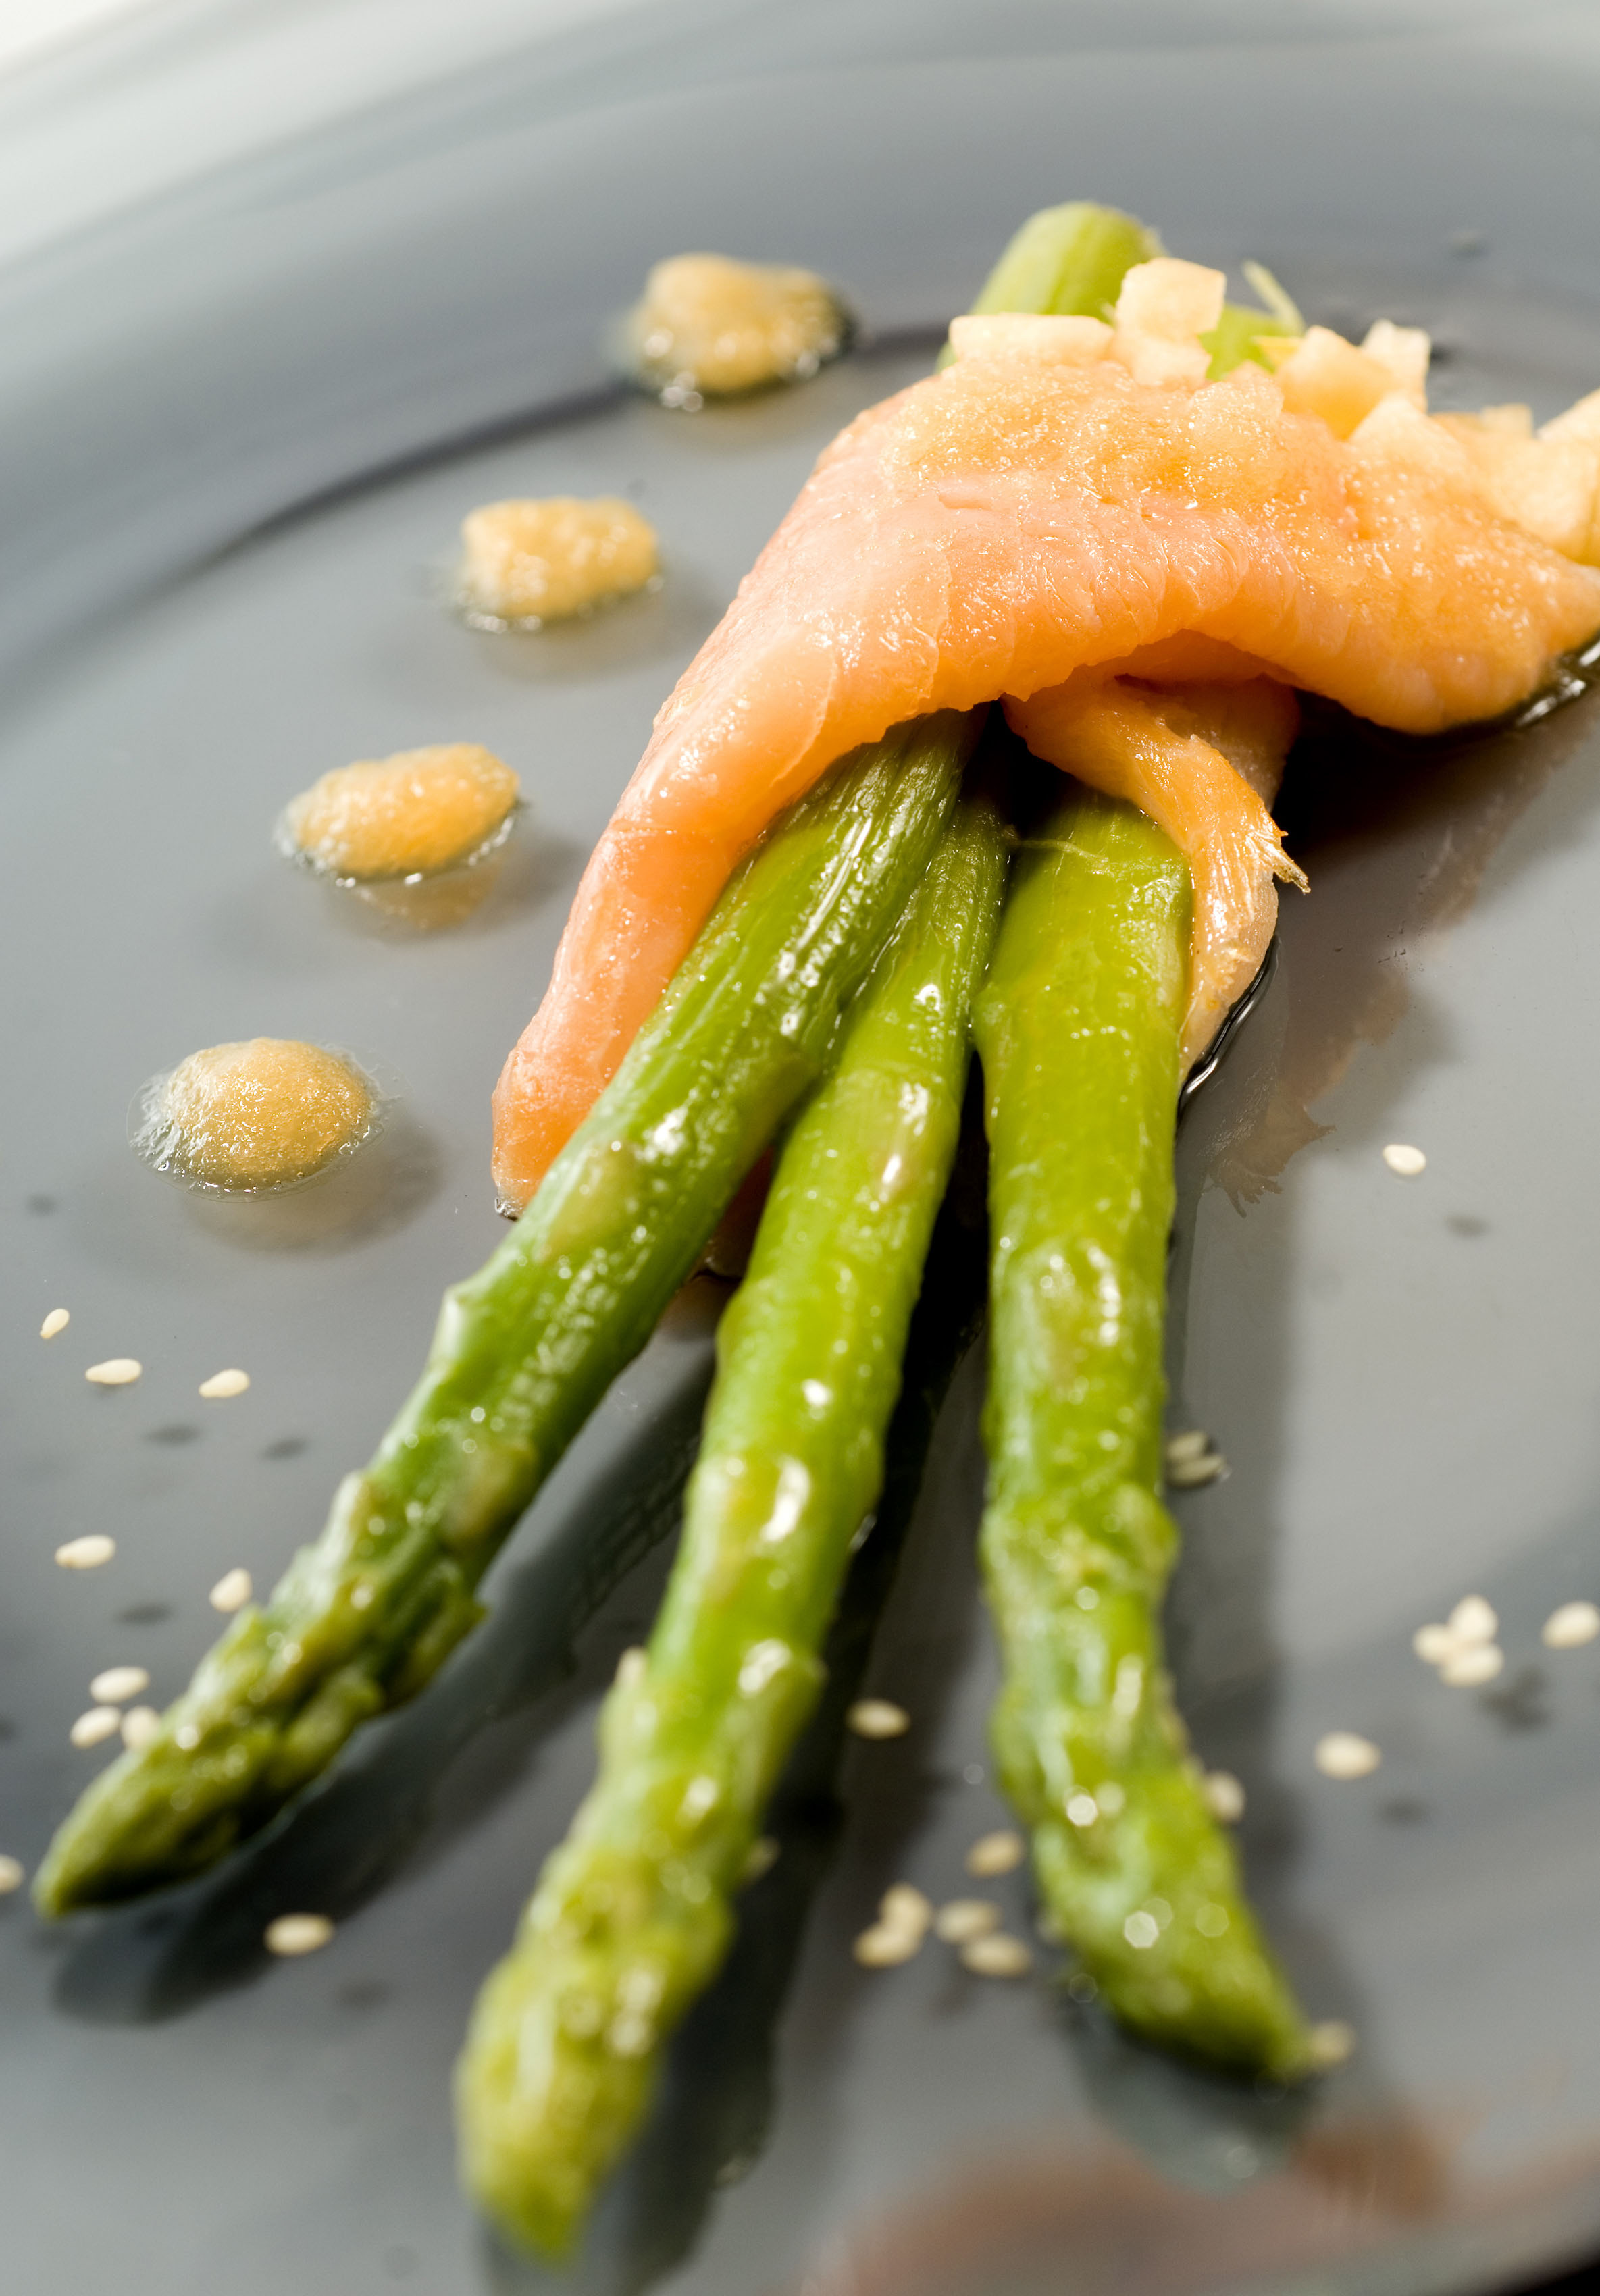 Asparagi - Umago Cittanova Verteneglio Buie